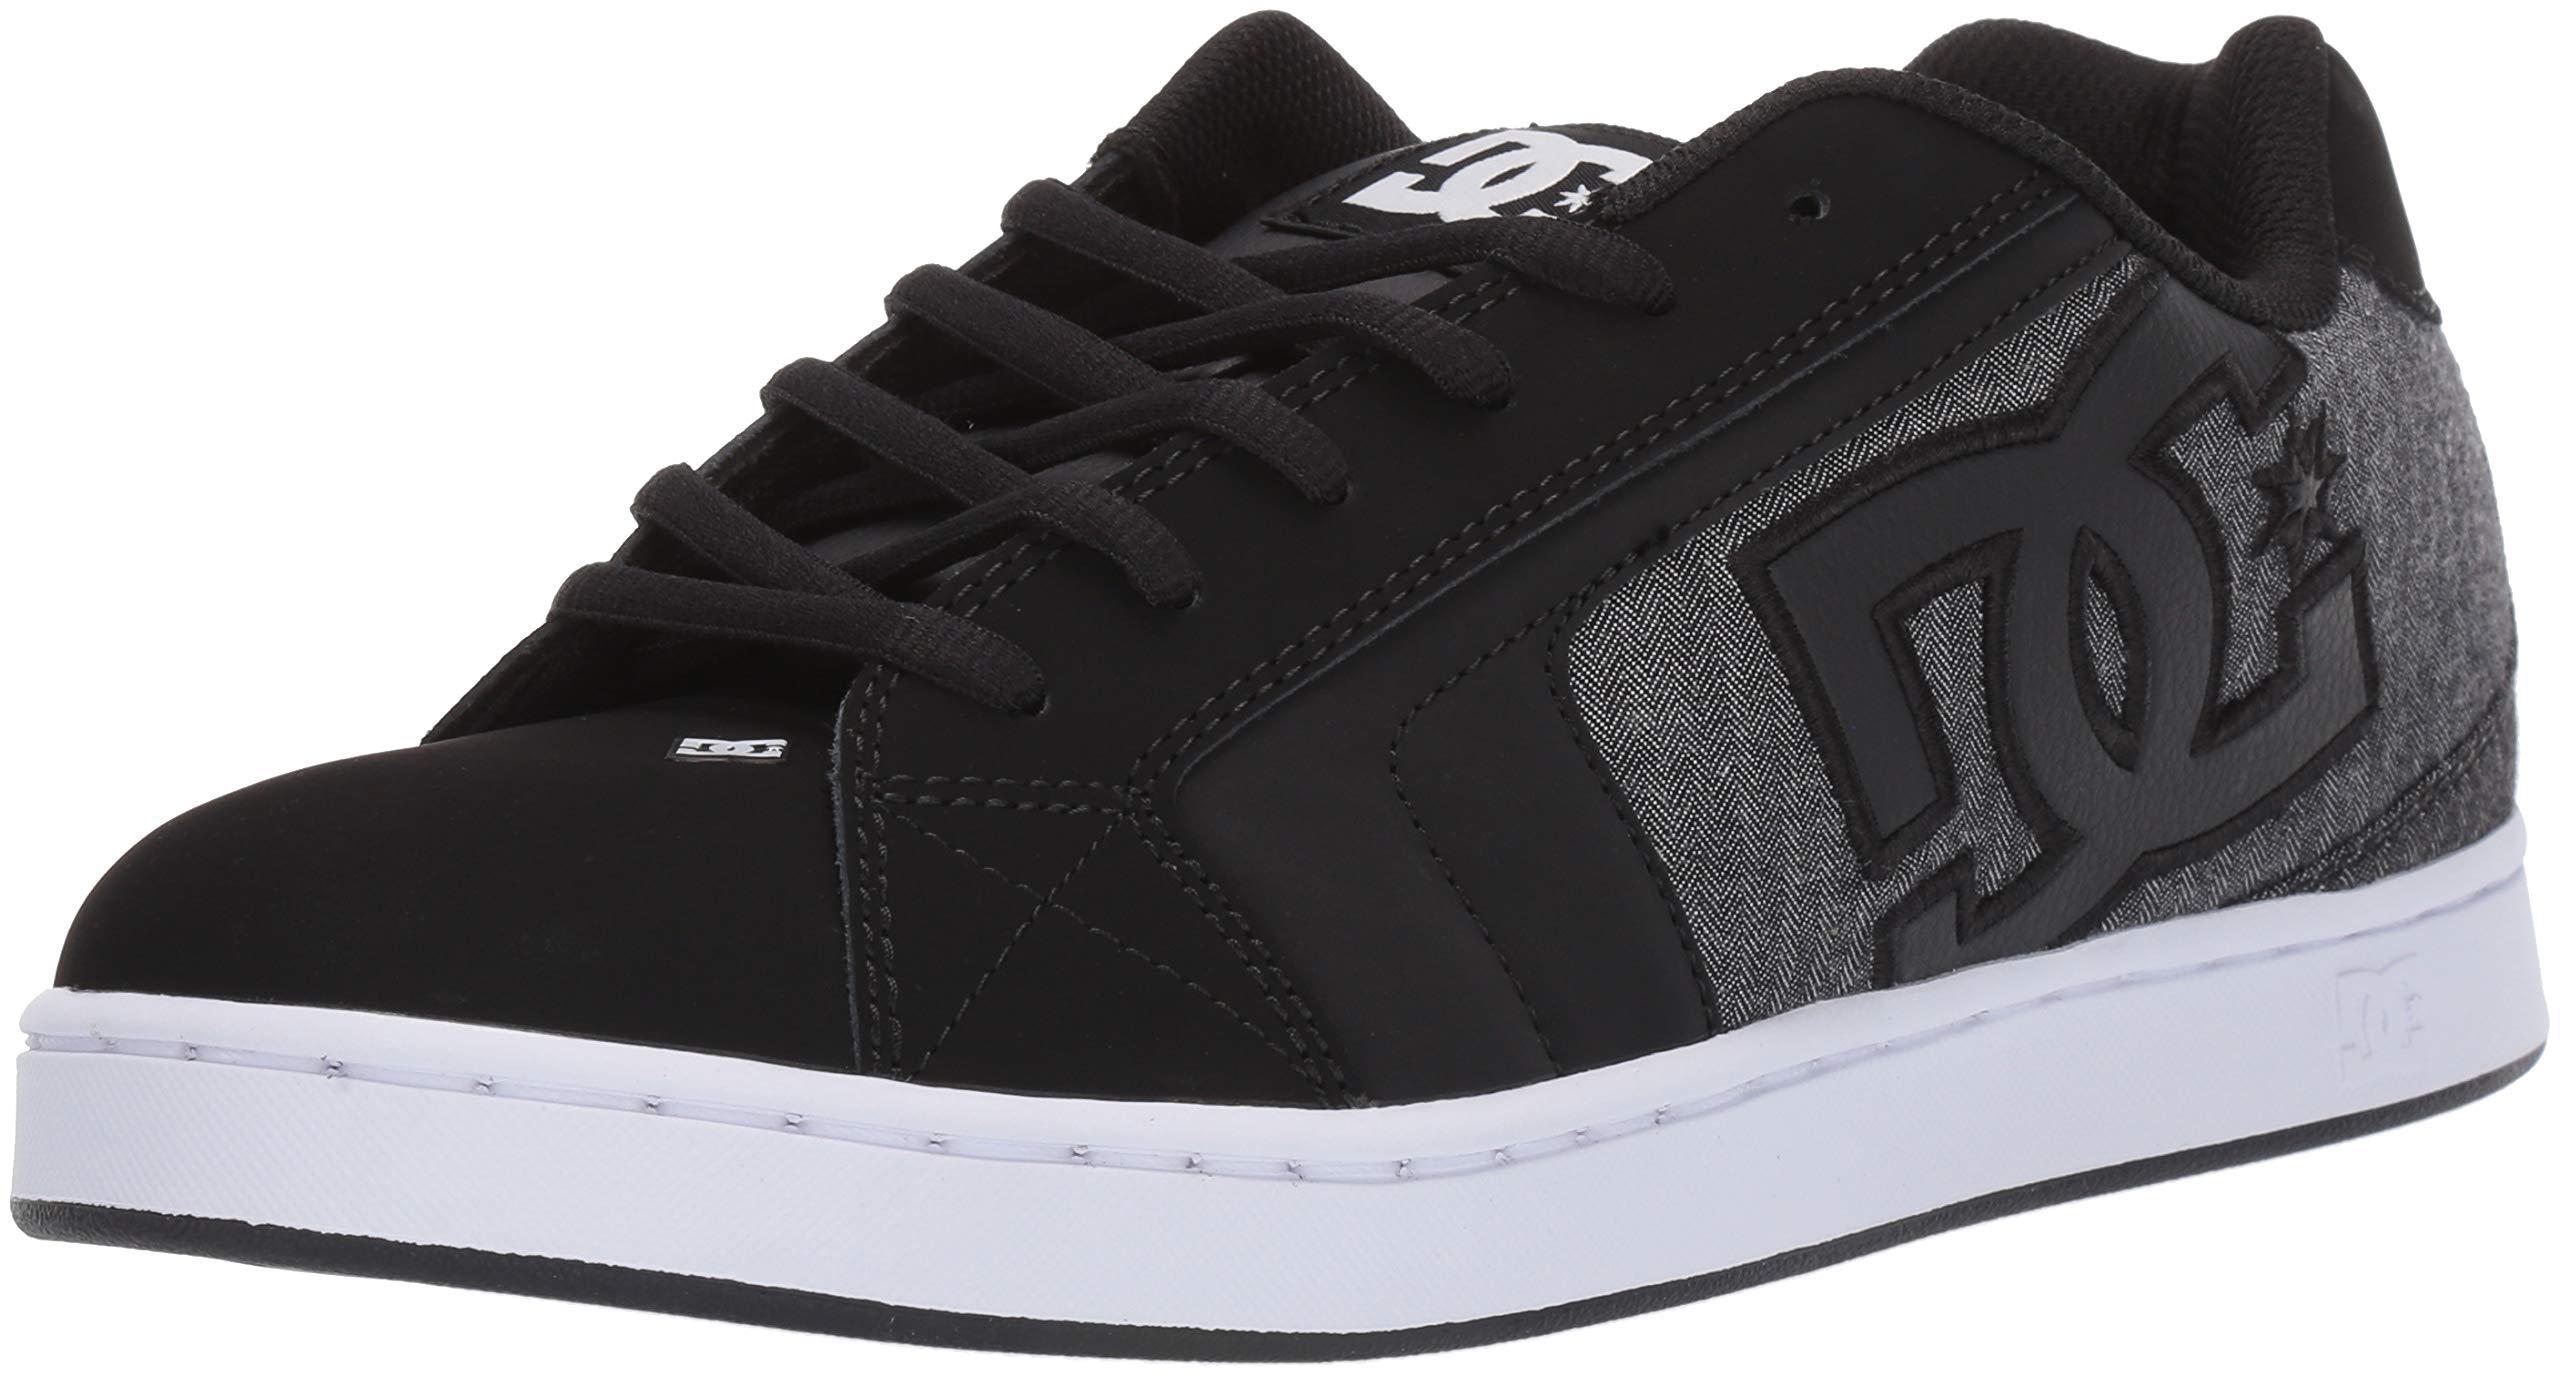 DC Men's Net Se-K Skate Shoe, Black Resin, 10.5 M US